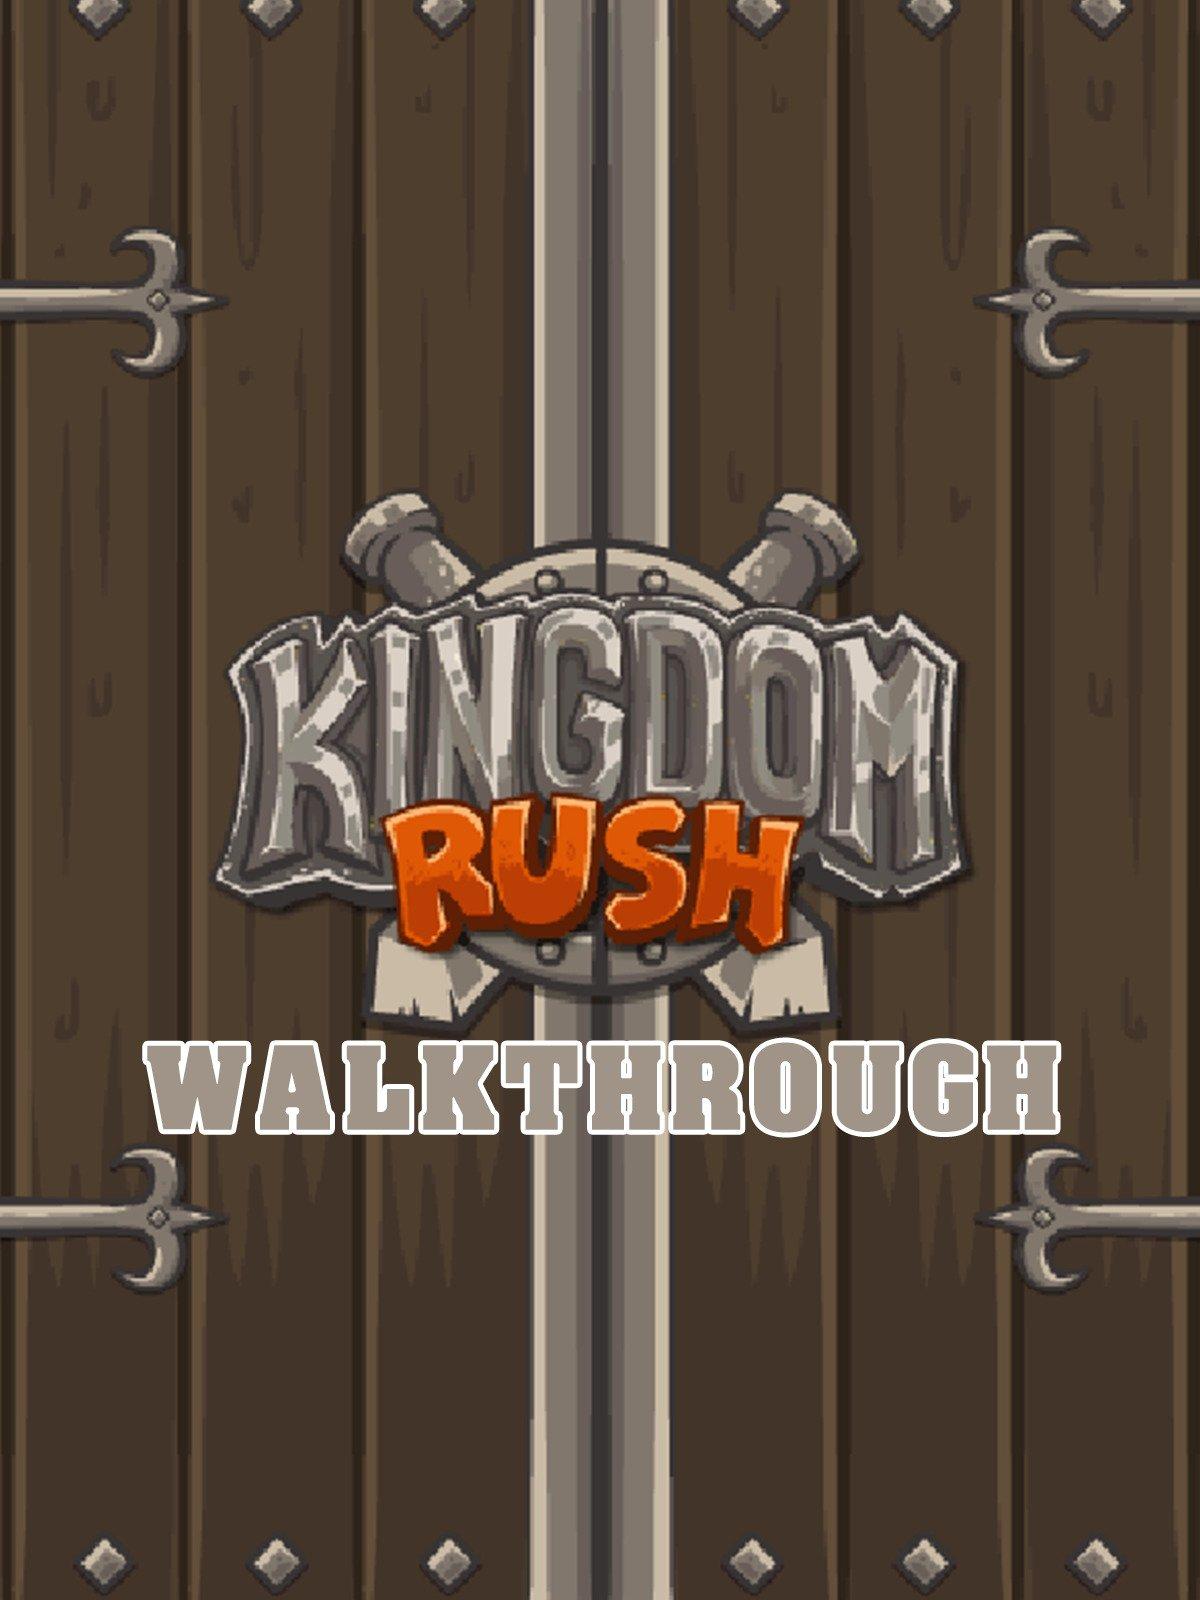 Clip: Kingdom Rush Walkthrough